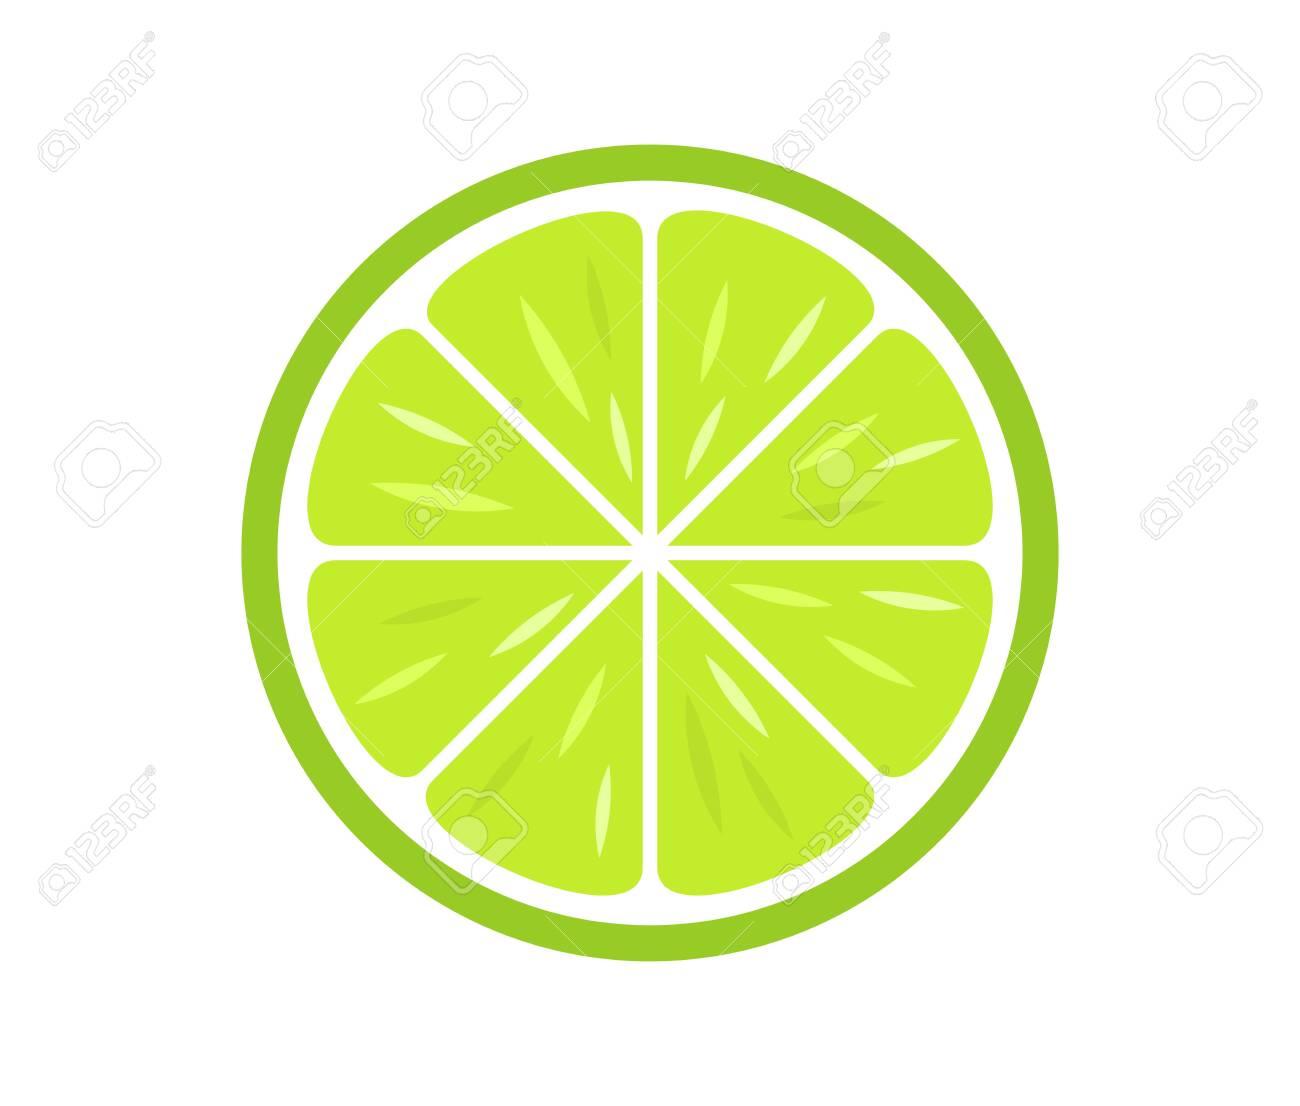 Green citrus lime slice icon. Vector illustration. - 141795535